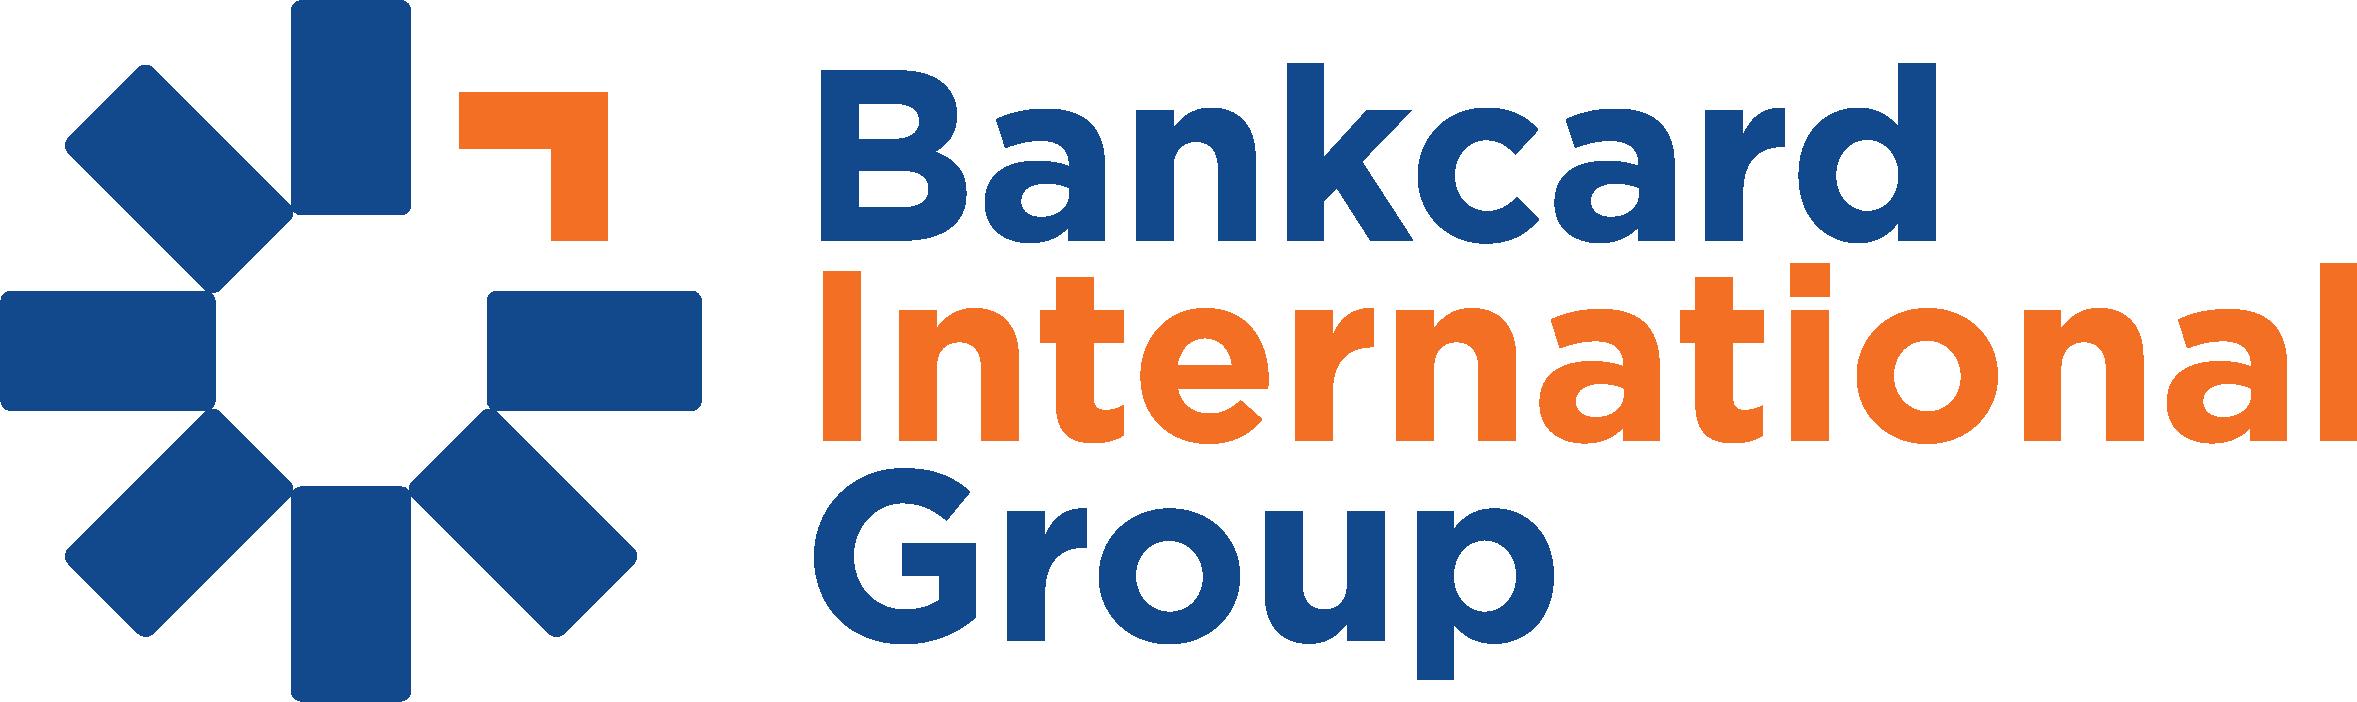 Bankcard International Group - High Risk Merchant Services